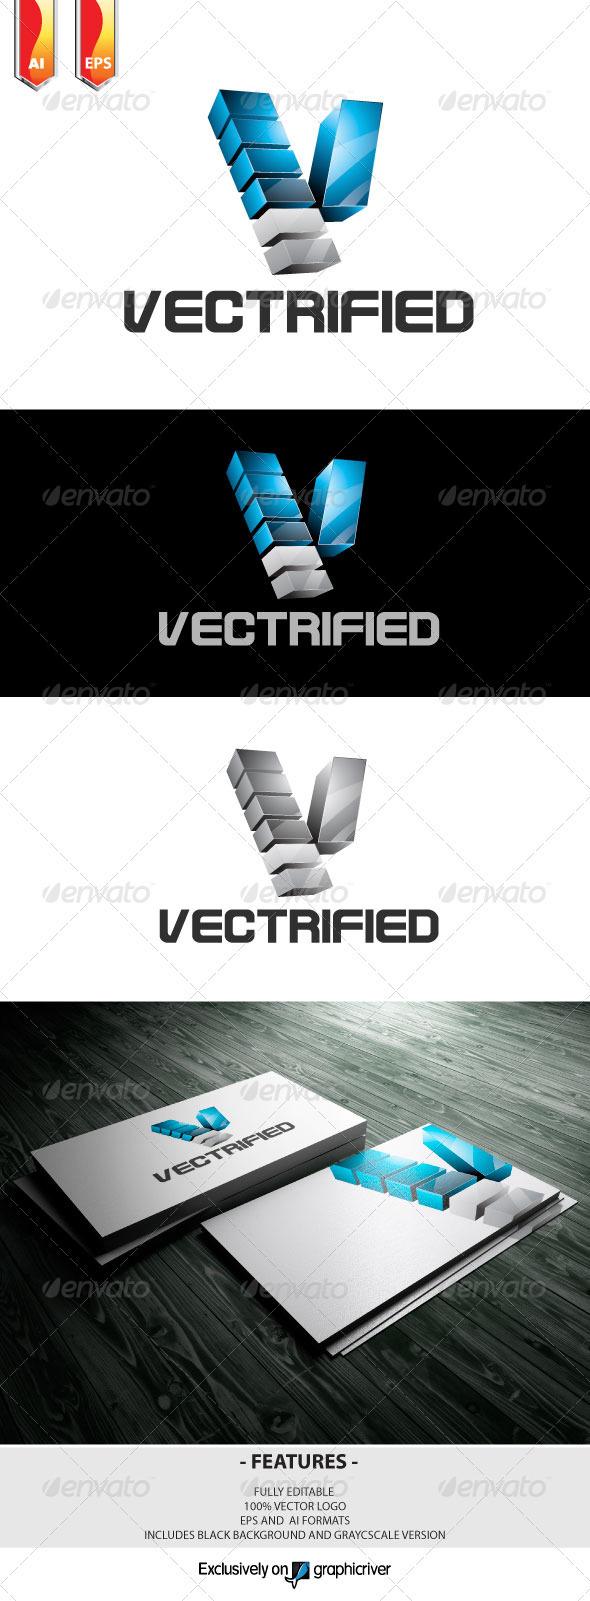 GraphicRiver Vectrified Logo 3227124